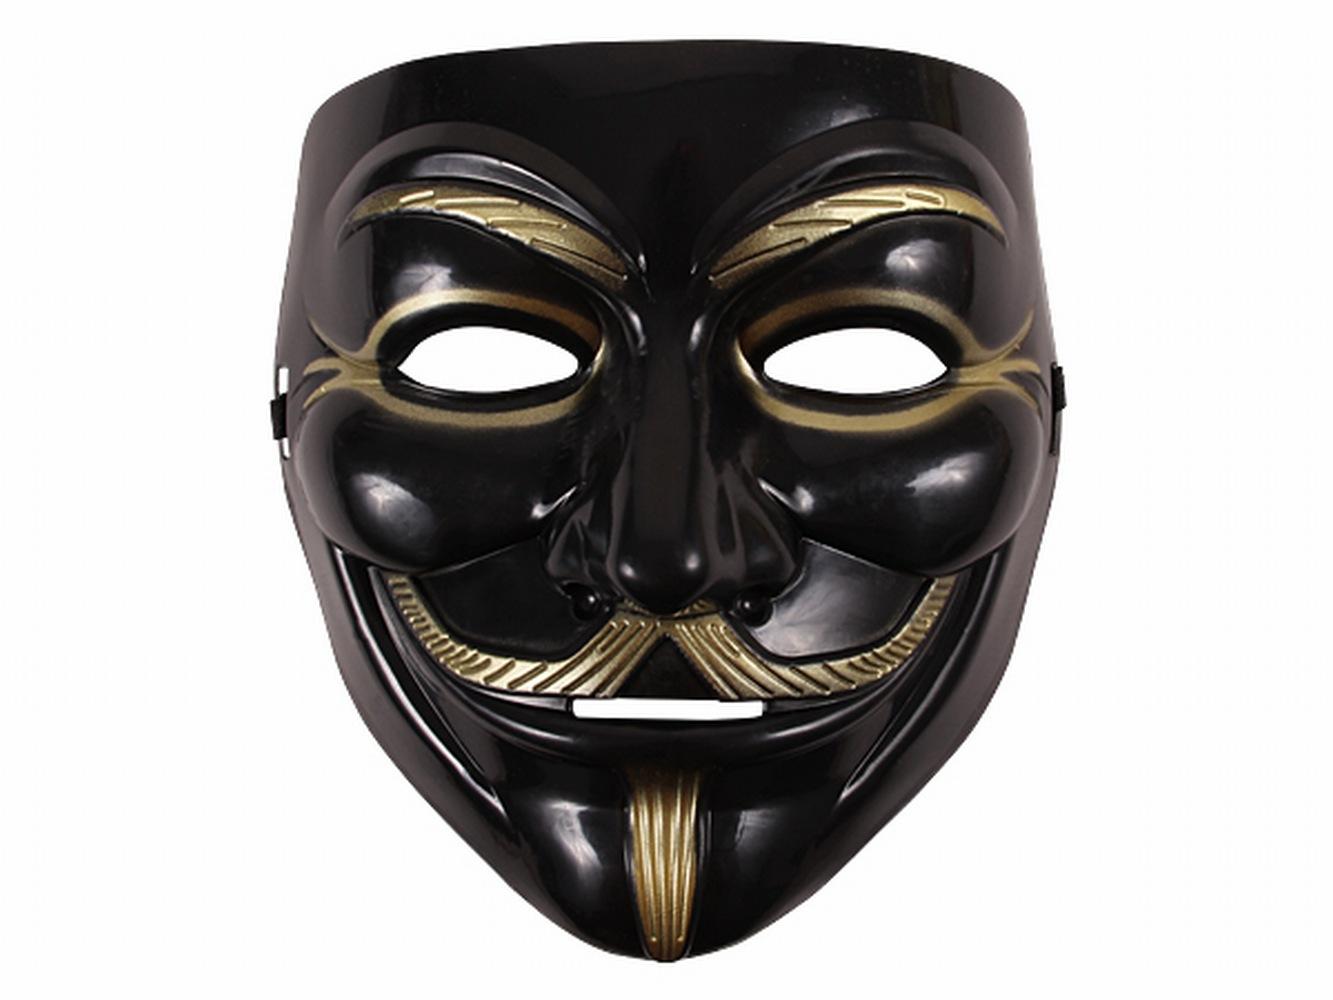 guy fawkes maske schwarz gold v wie vendetta anonymous cosplay halloween ebay. Black Bedroom Furniture Sets. Home Design Ideas